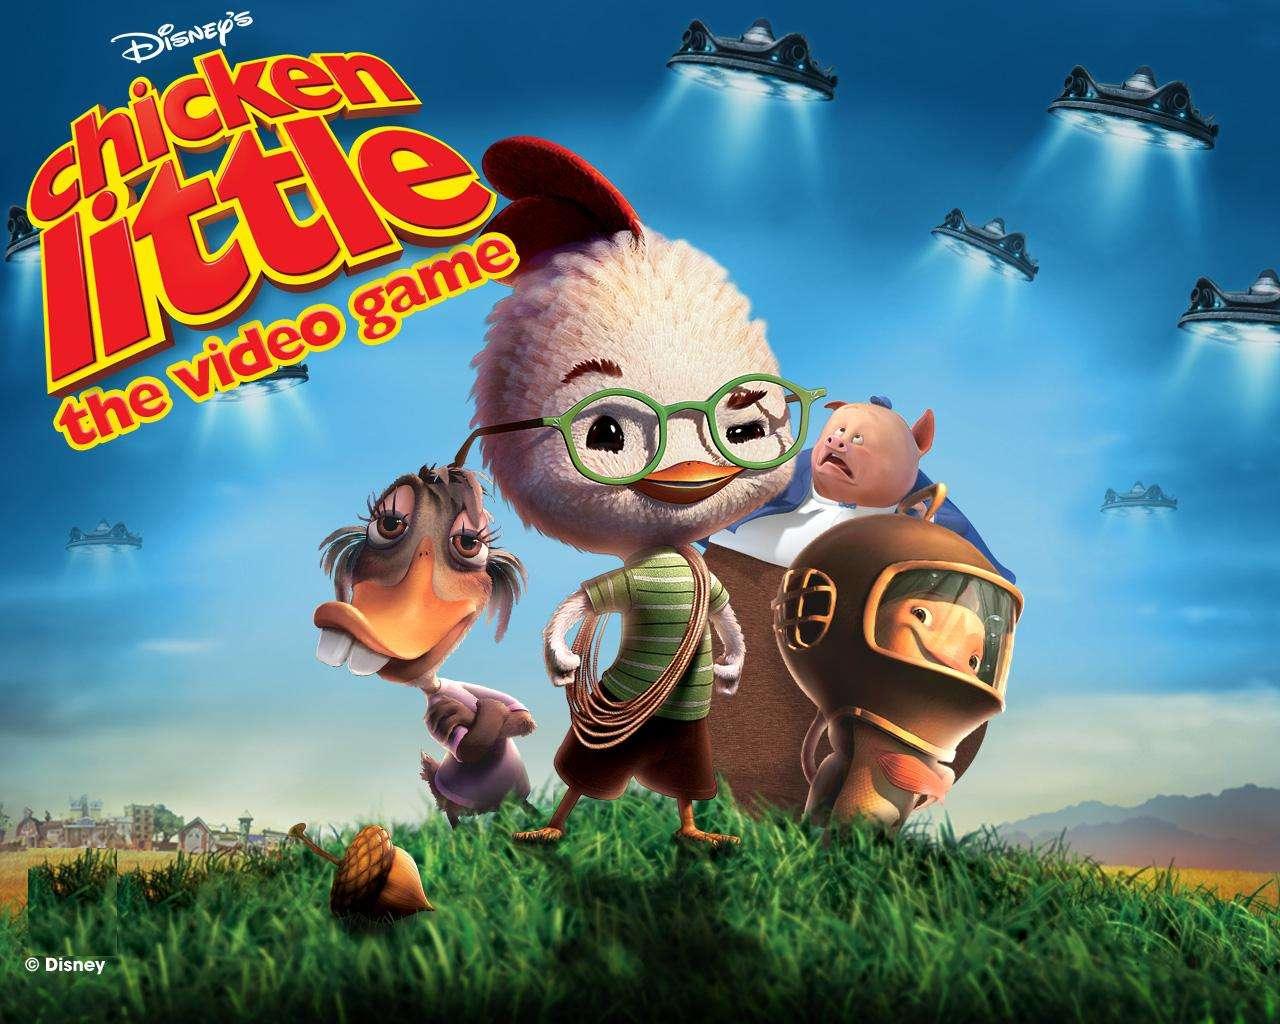 Chicken Little Galactic Traveler online Disney game